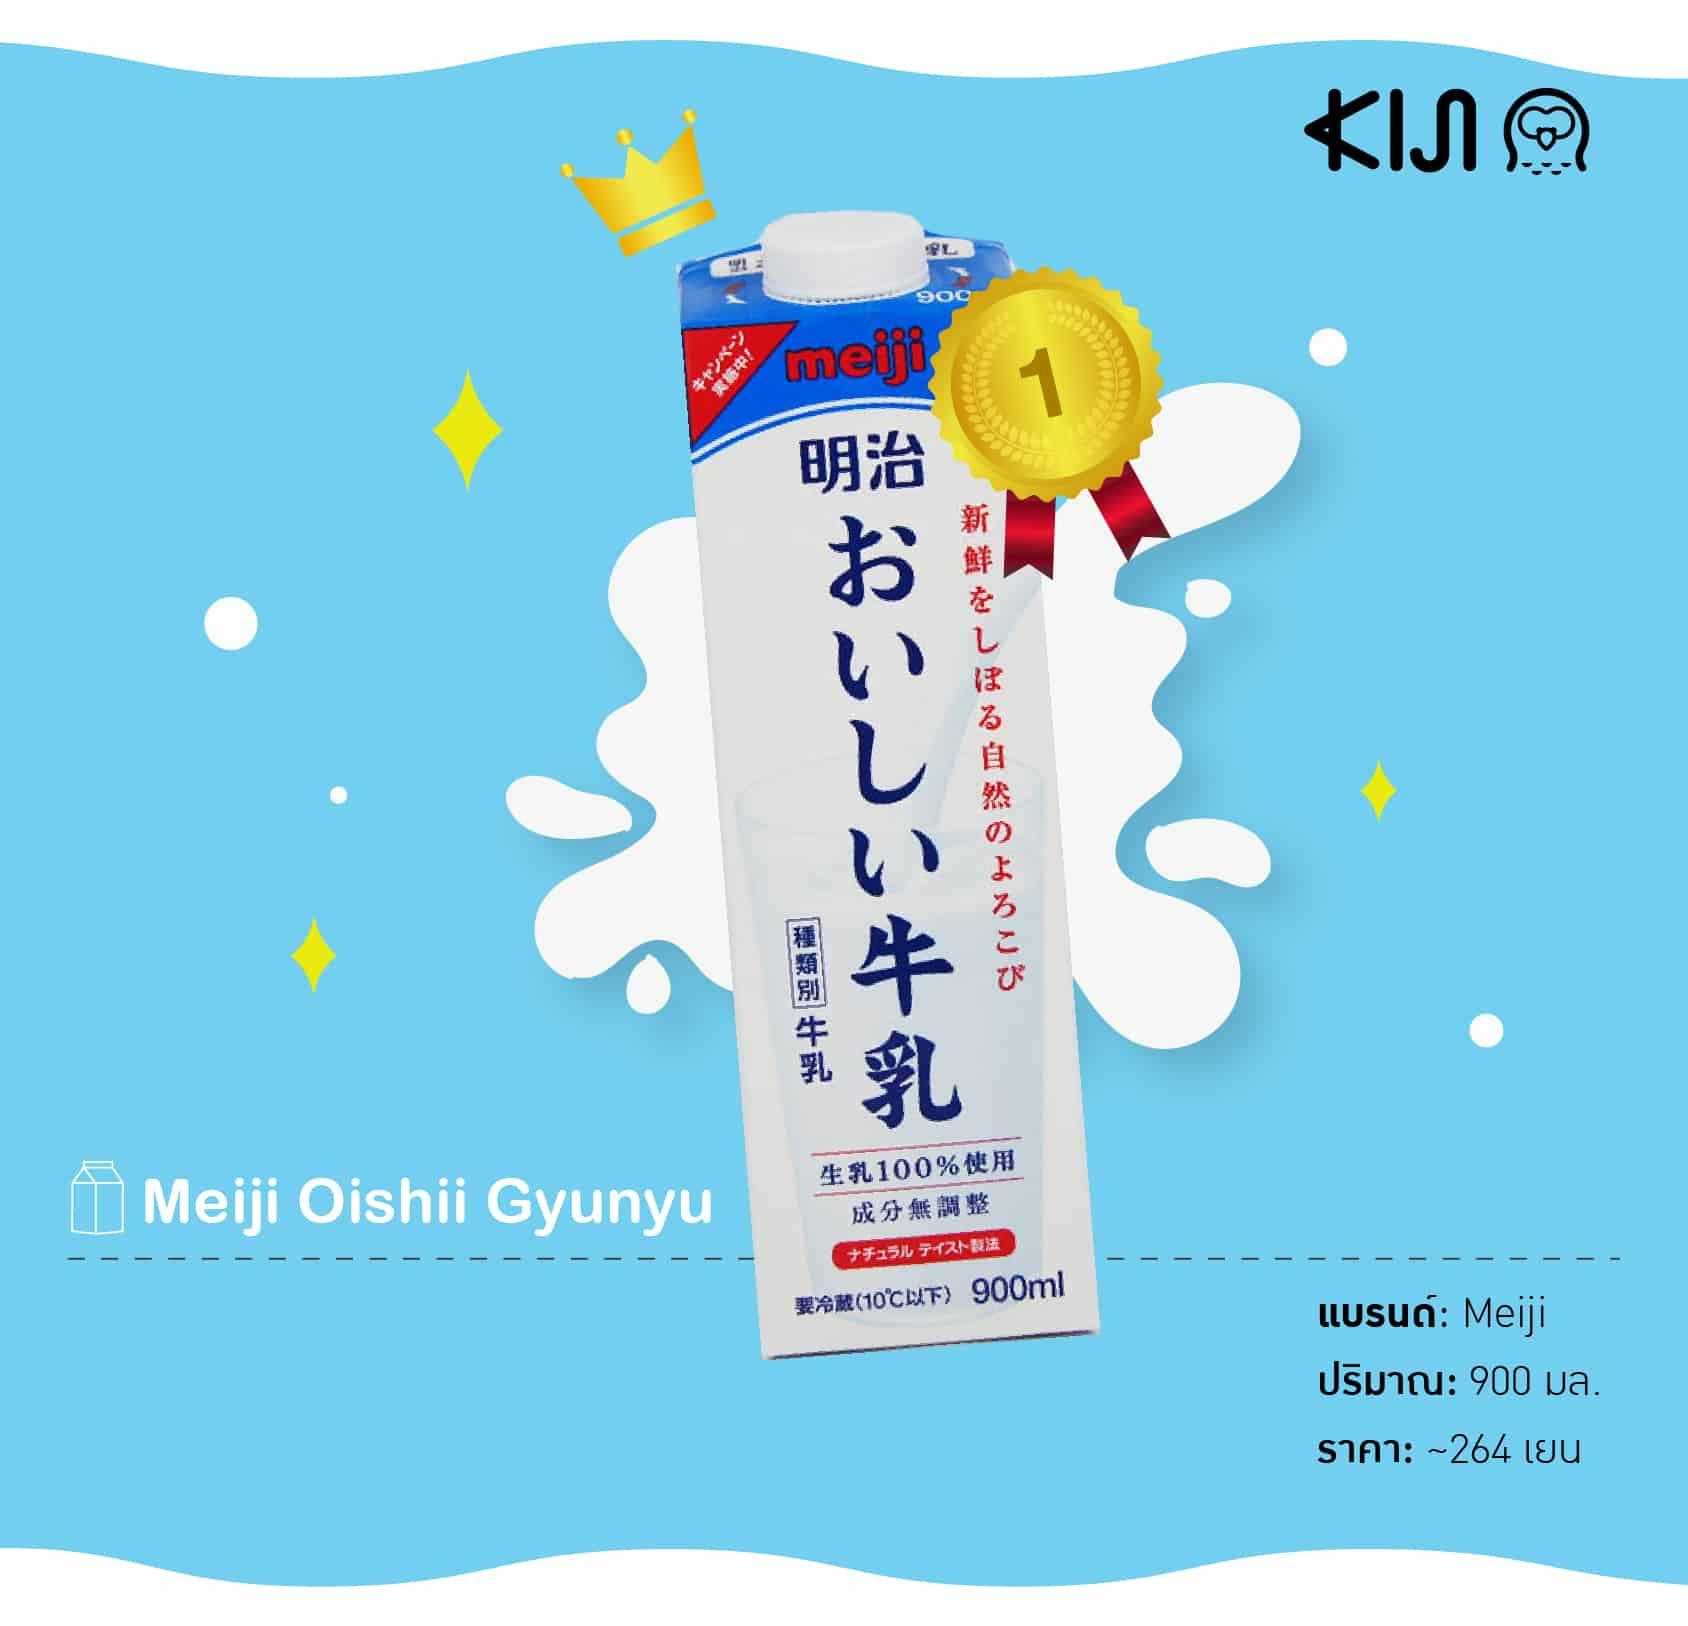 Meiji Oishii Gyunyuนม ที่คน ญี่ปุ่น ชอบมากที่สุด